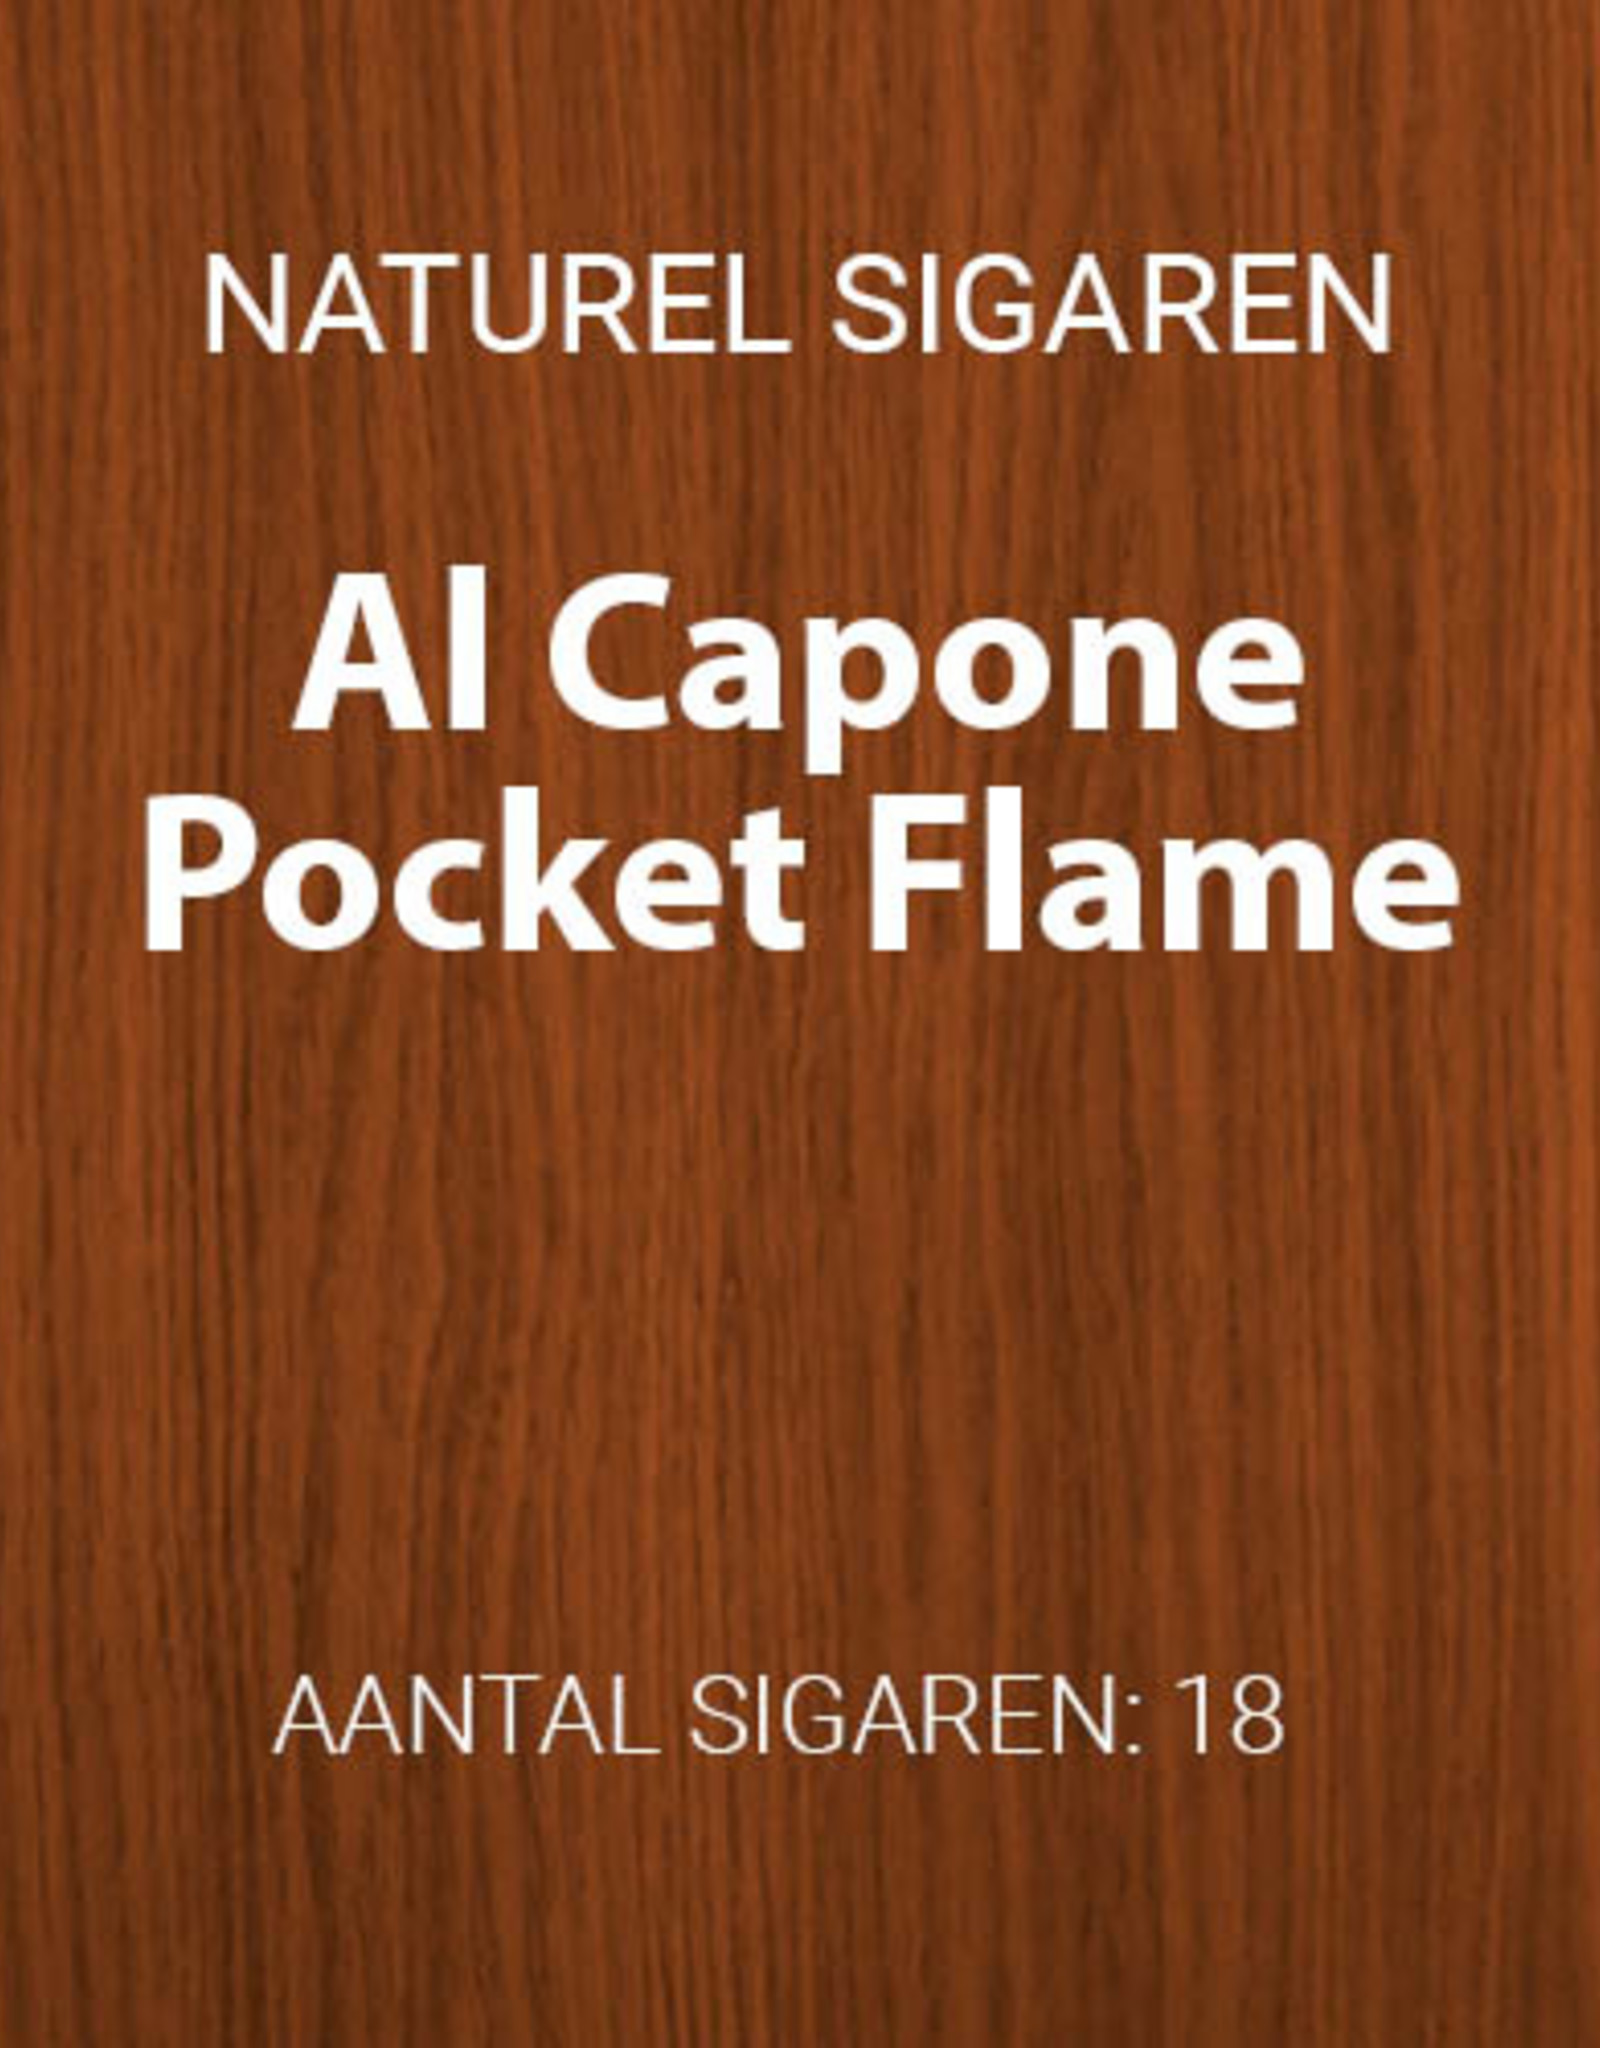 Al Capone Pocket Flame